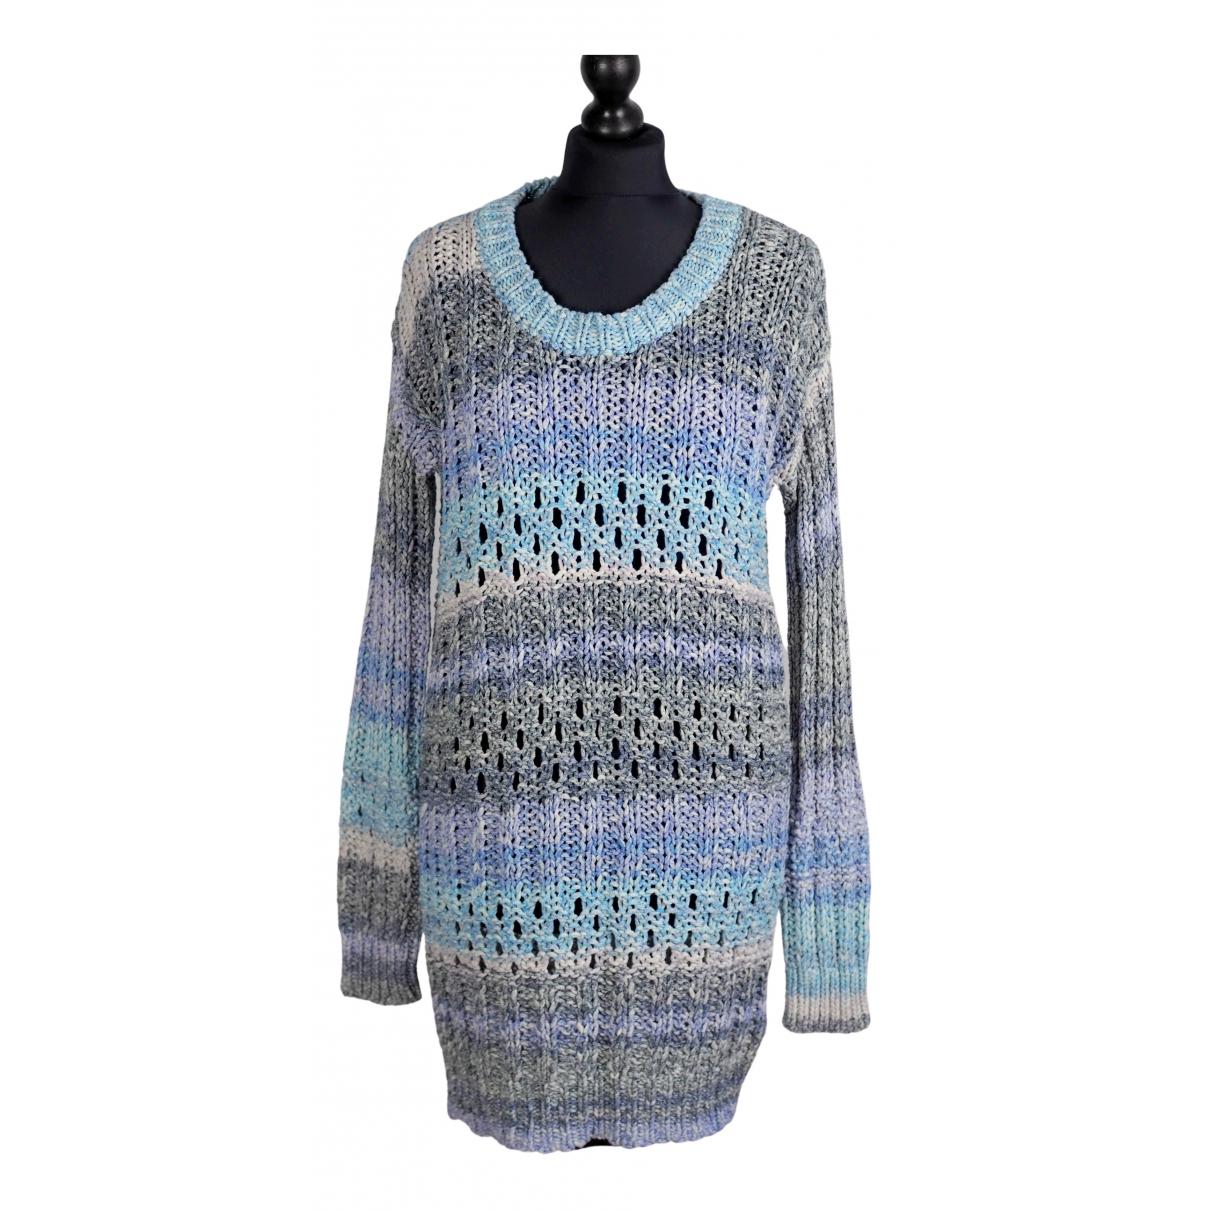 Matthew Williamson \N Kleid in  Blau Baumwolle